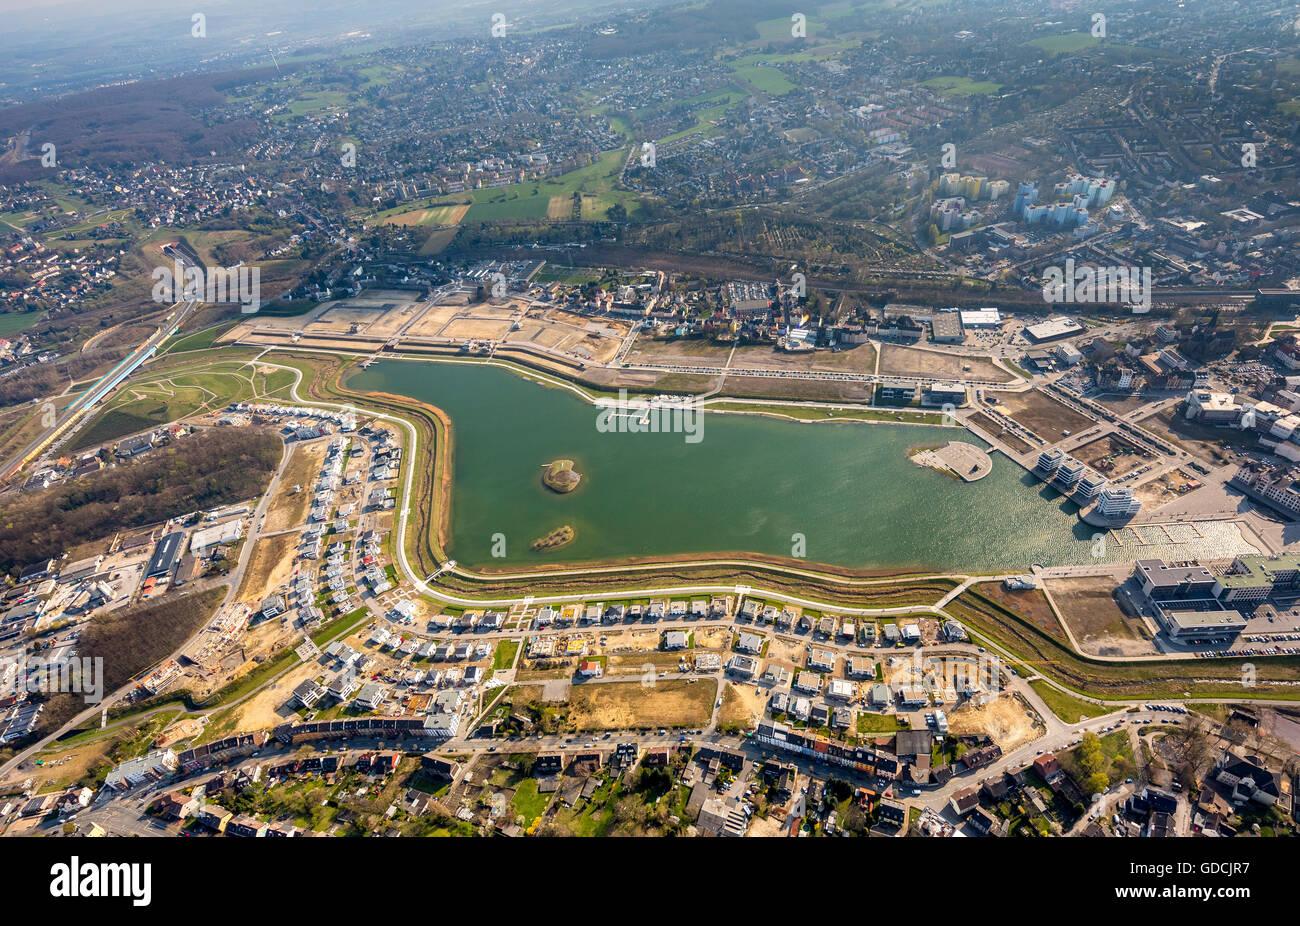 Aerial view, Phoenix Lake Dortmund with adjoining building, Dortmund, Ruhr aeria, north rhine-westphalia, Germany, - Stock Image